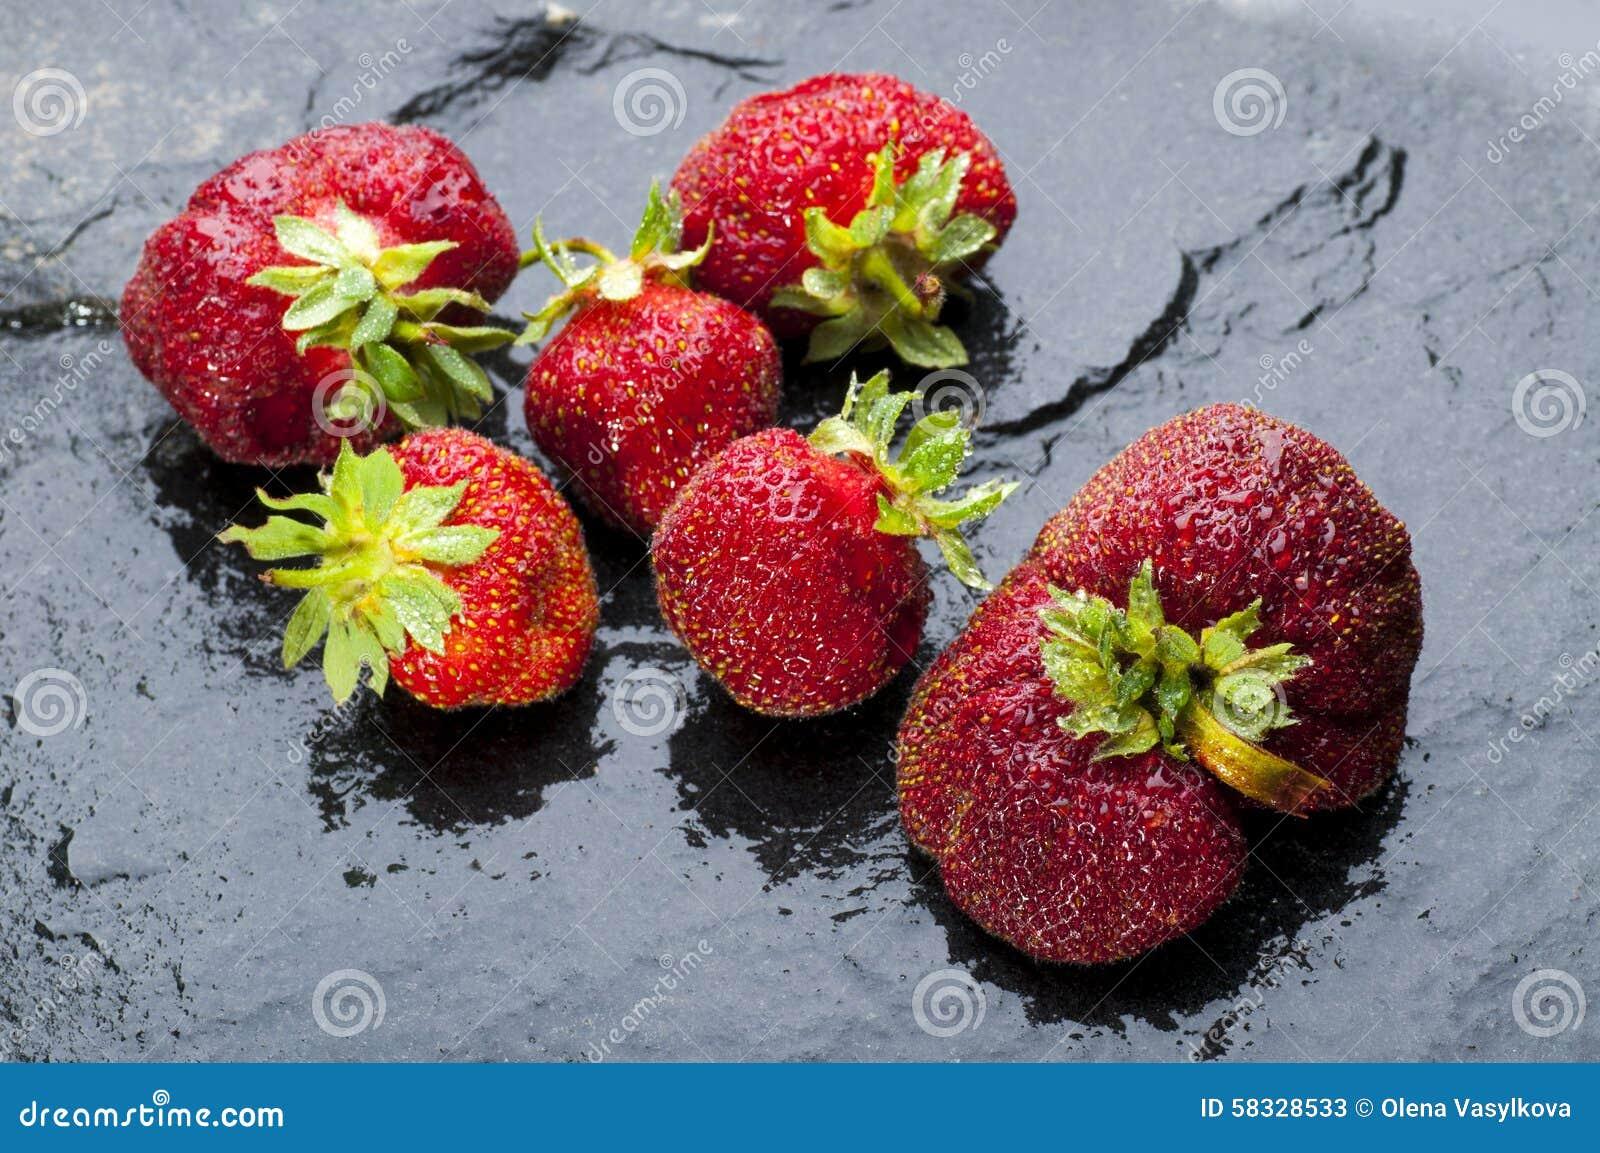 Ripe strawberries on black stone background